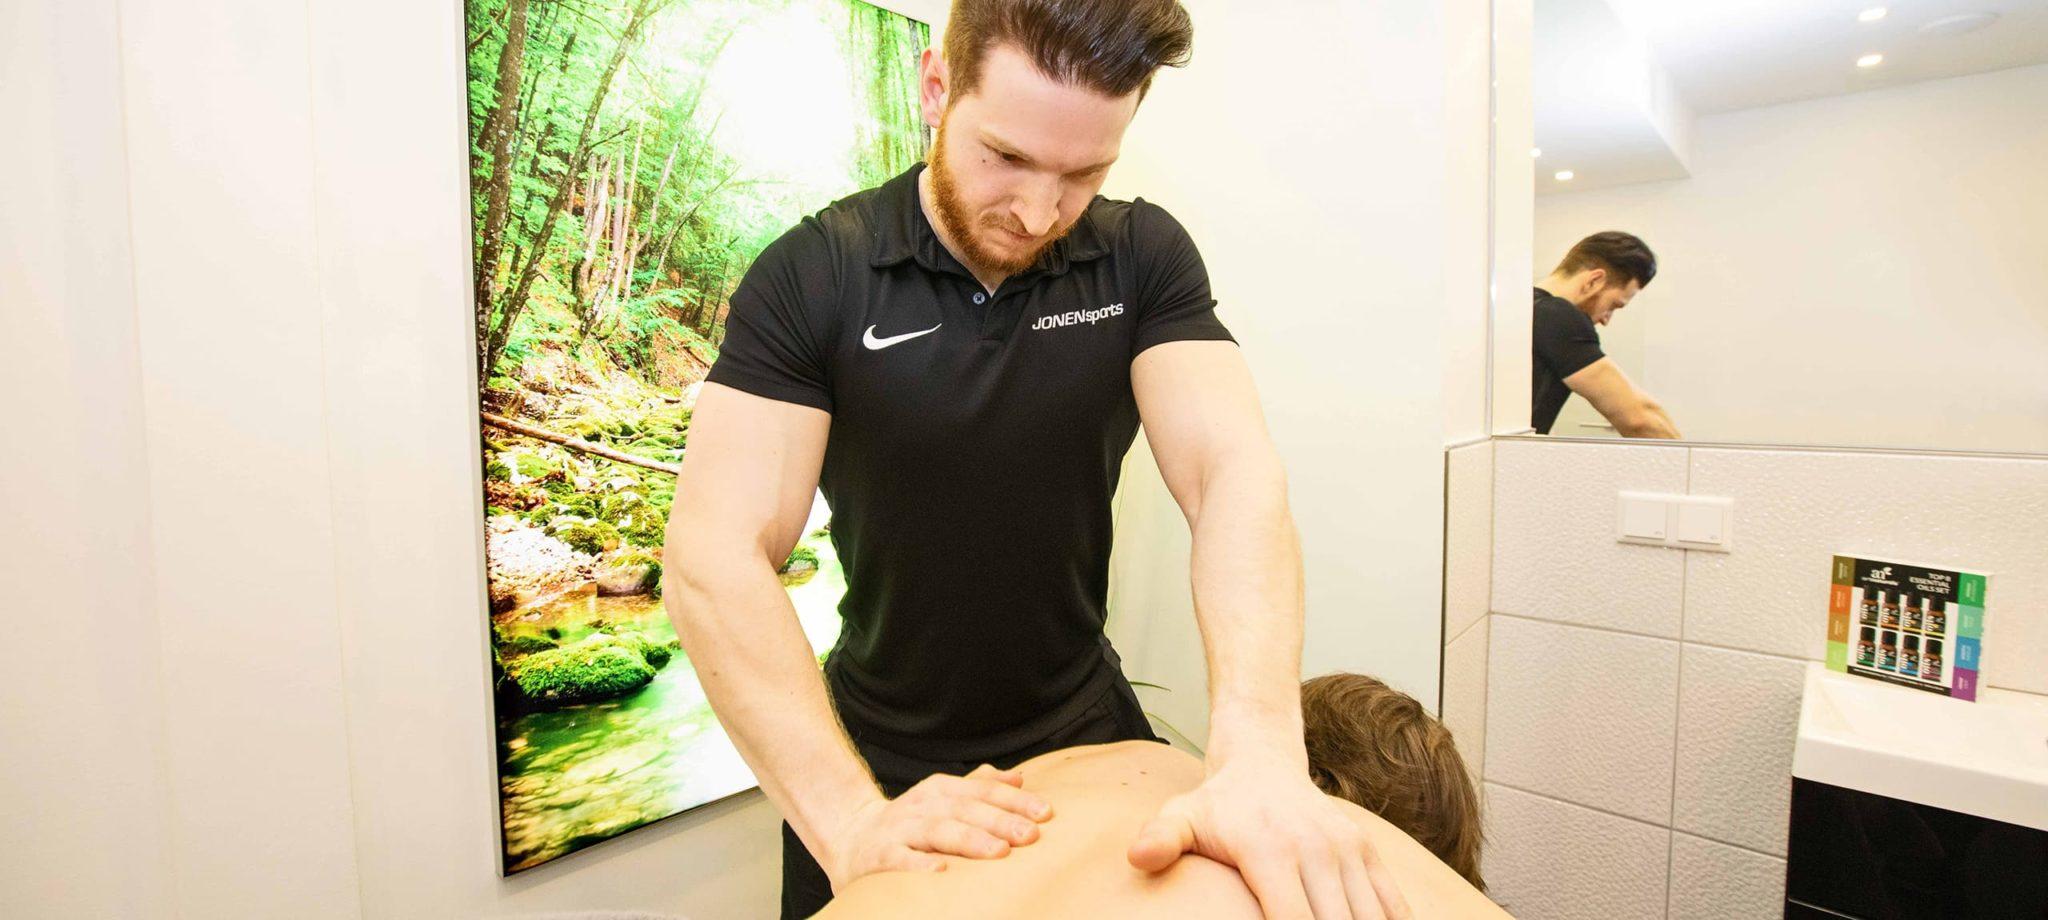 Massage Düsseldorf: Massagen im Private Spa ǀ JONENsports